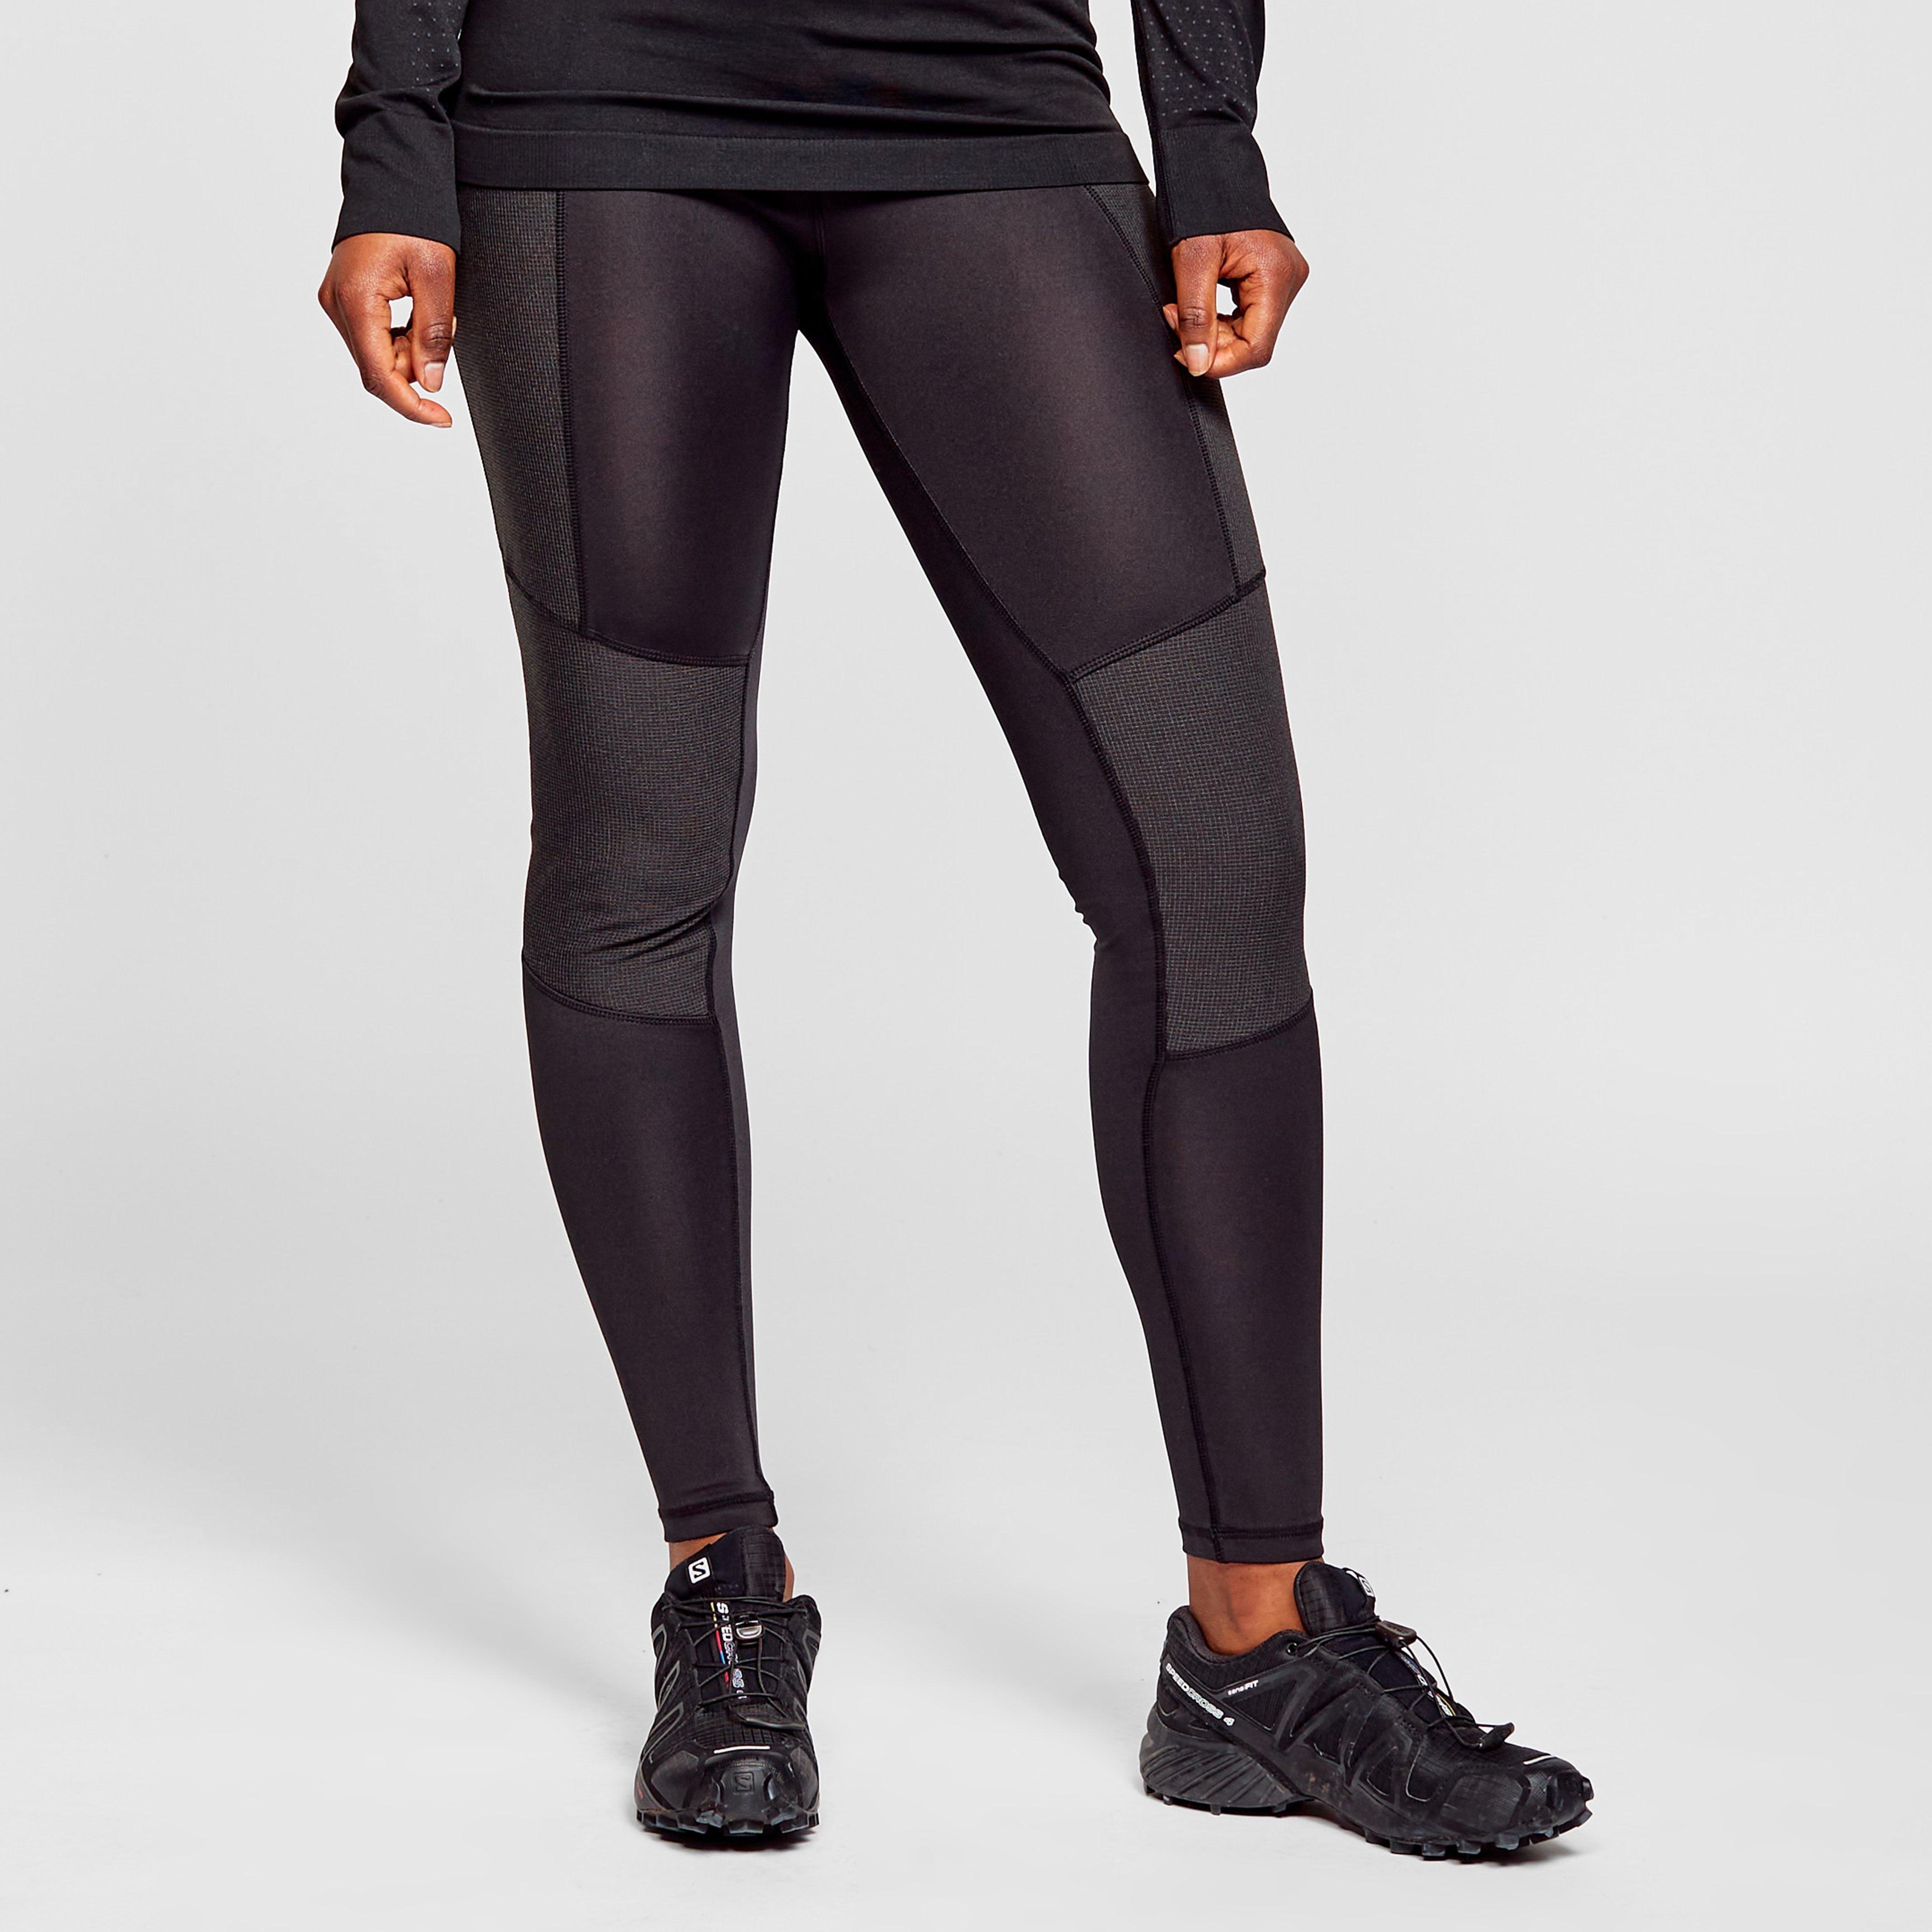 Oex Oex womens Technical Legging - Black, Black